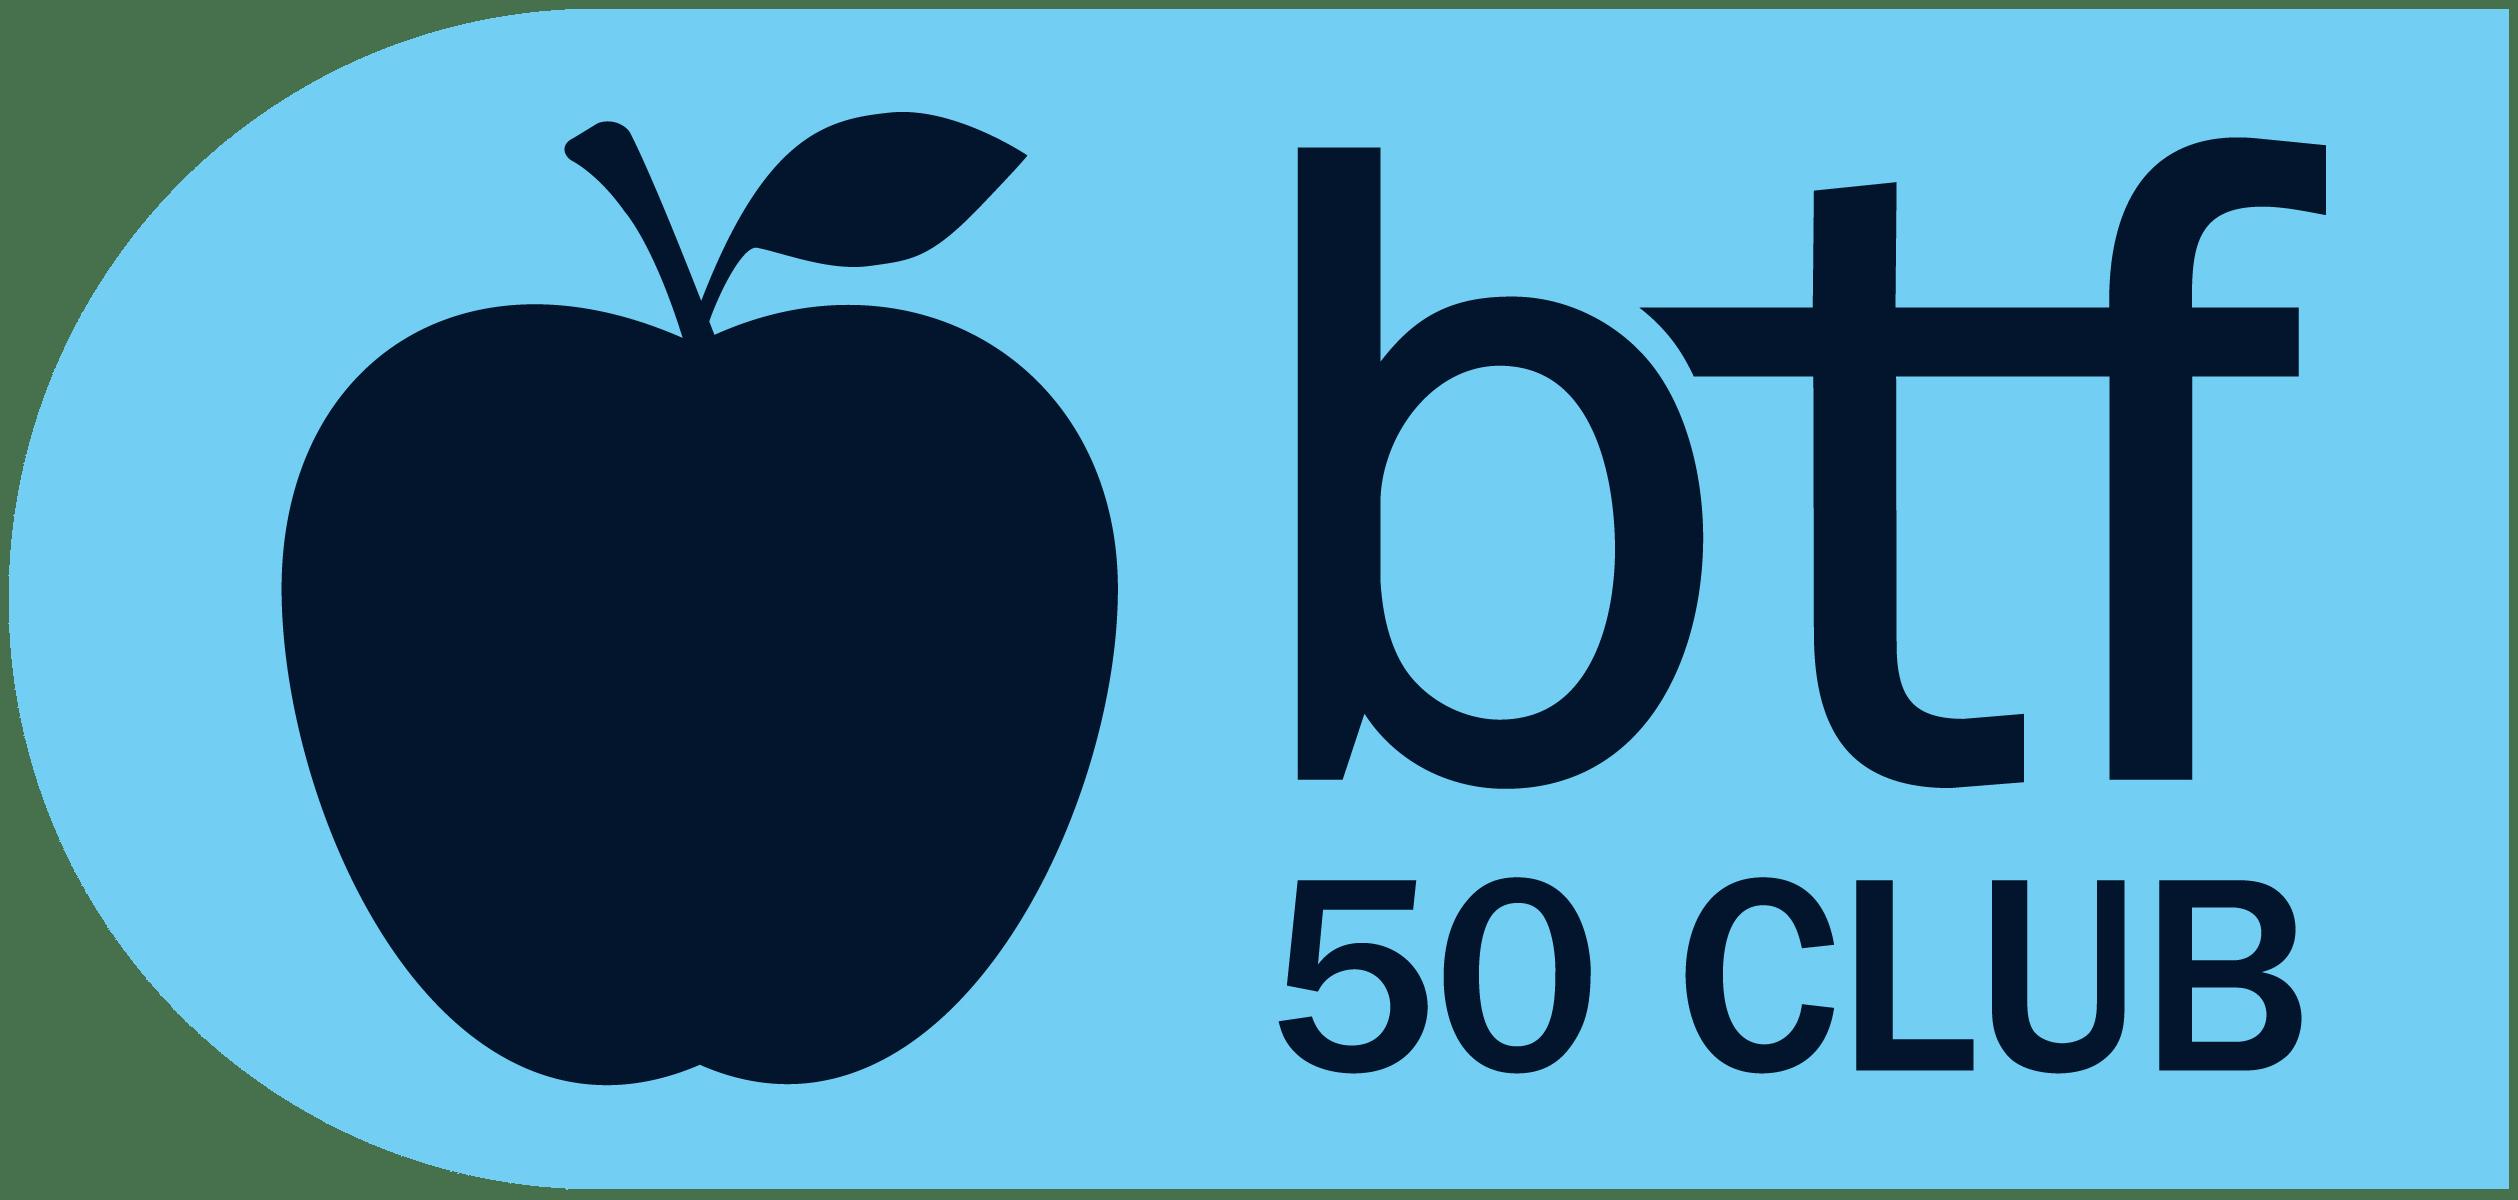 btf-50-club-2